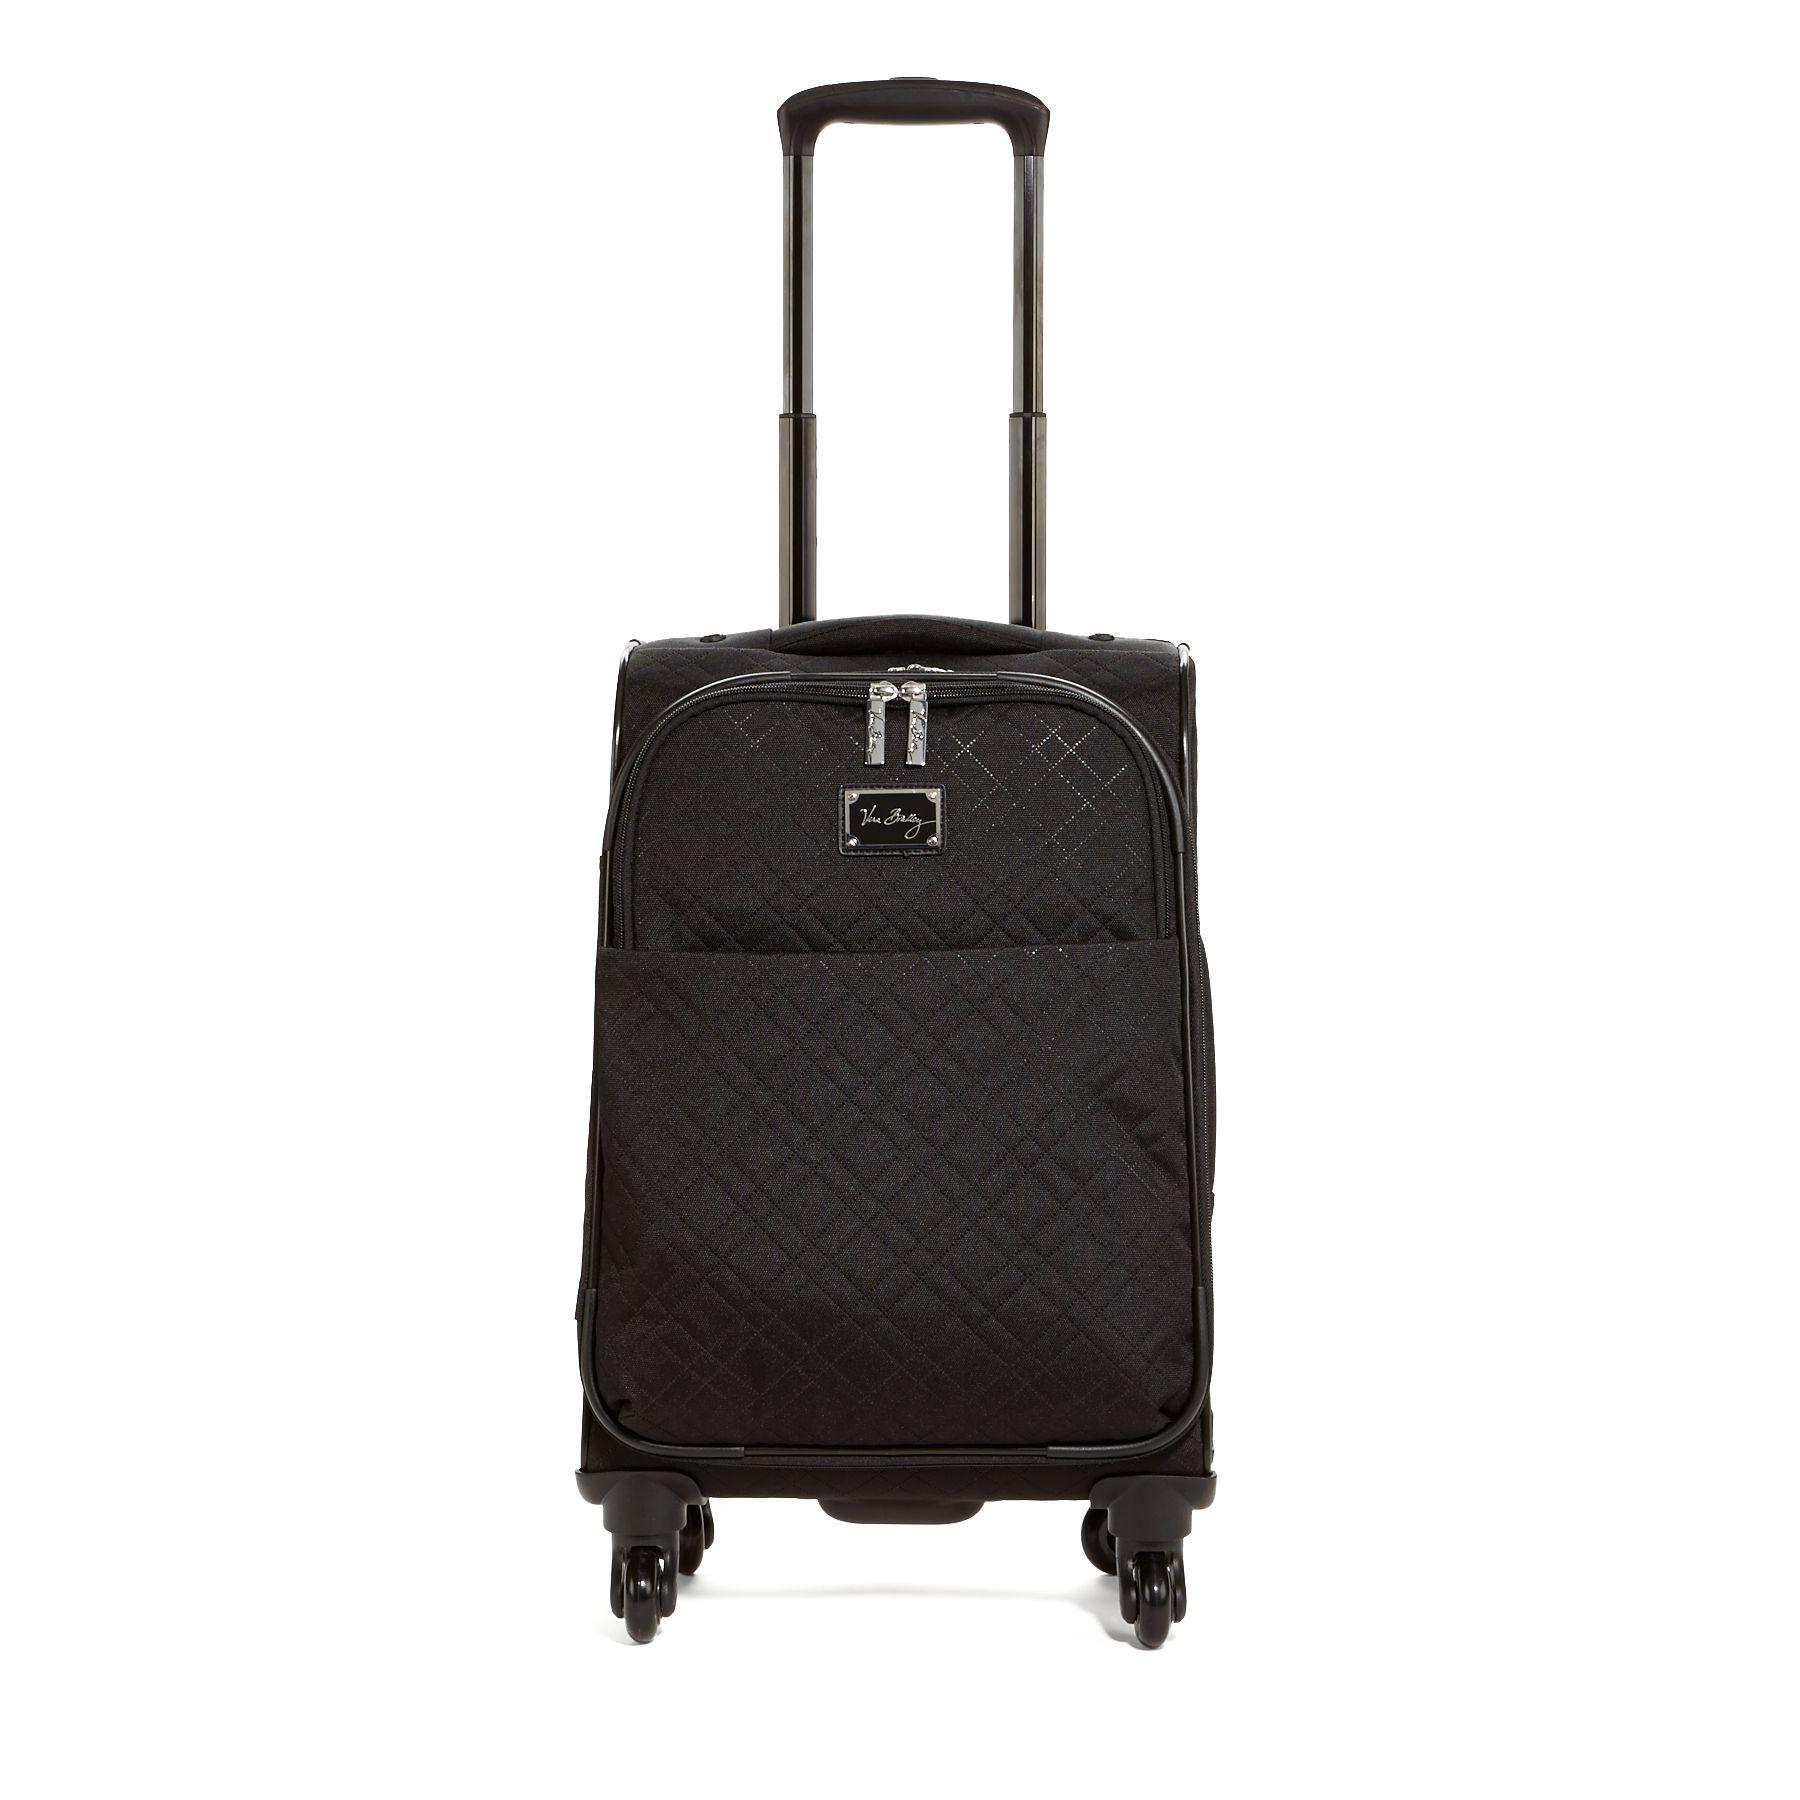 Vera Bradley Small Spinner Luggage In Classic Black